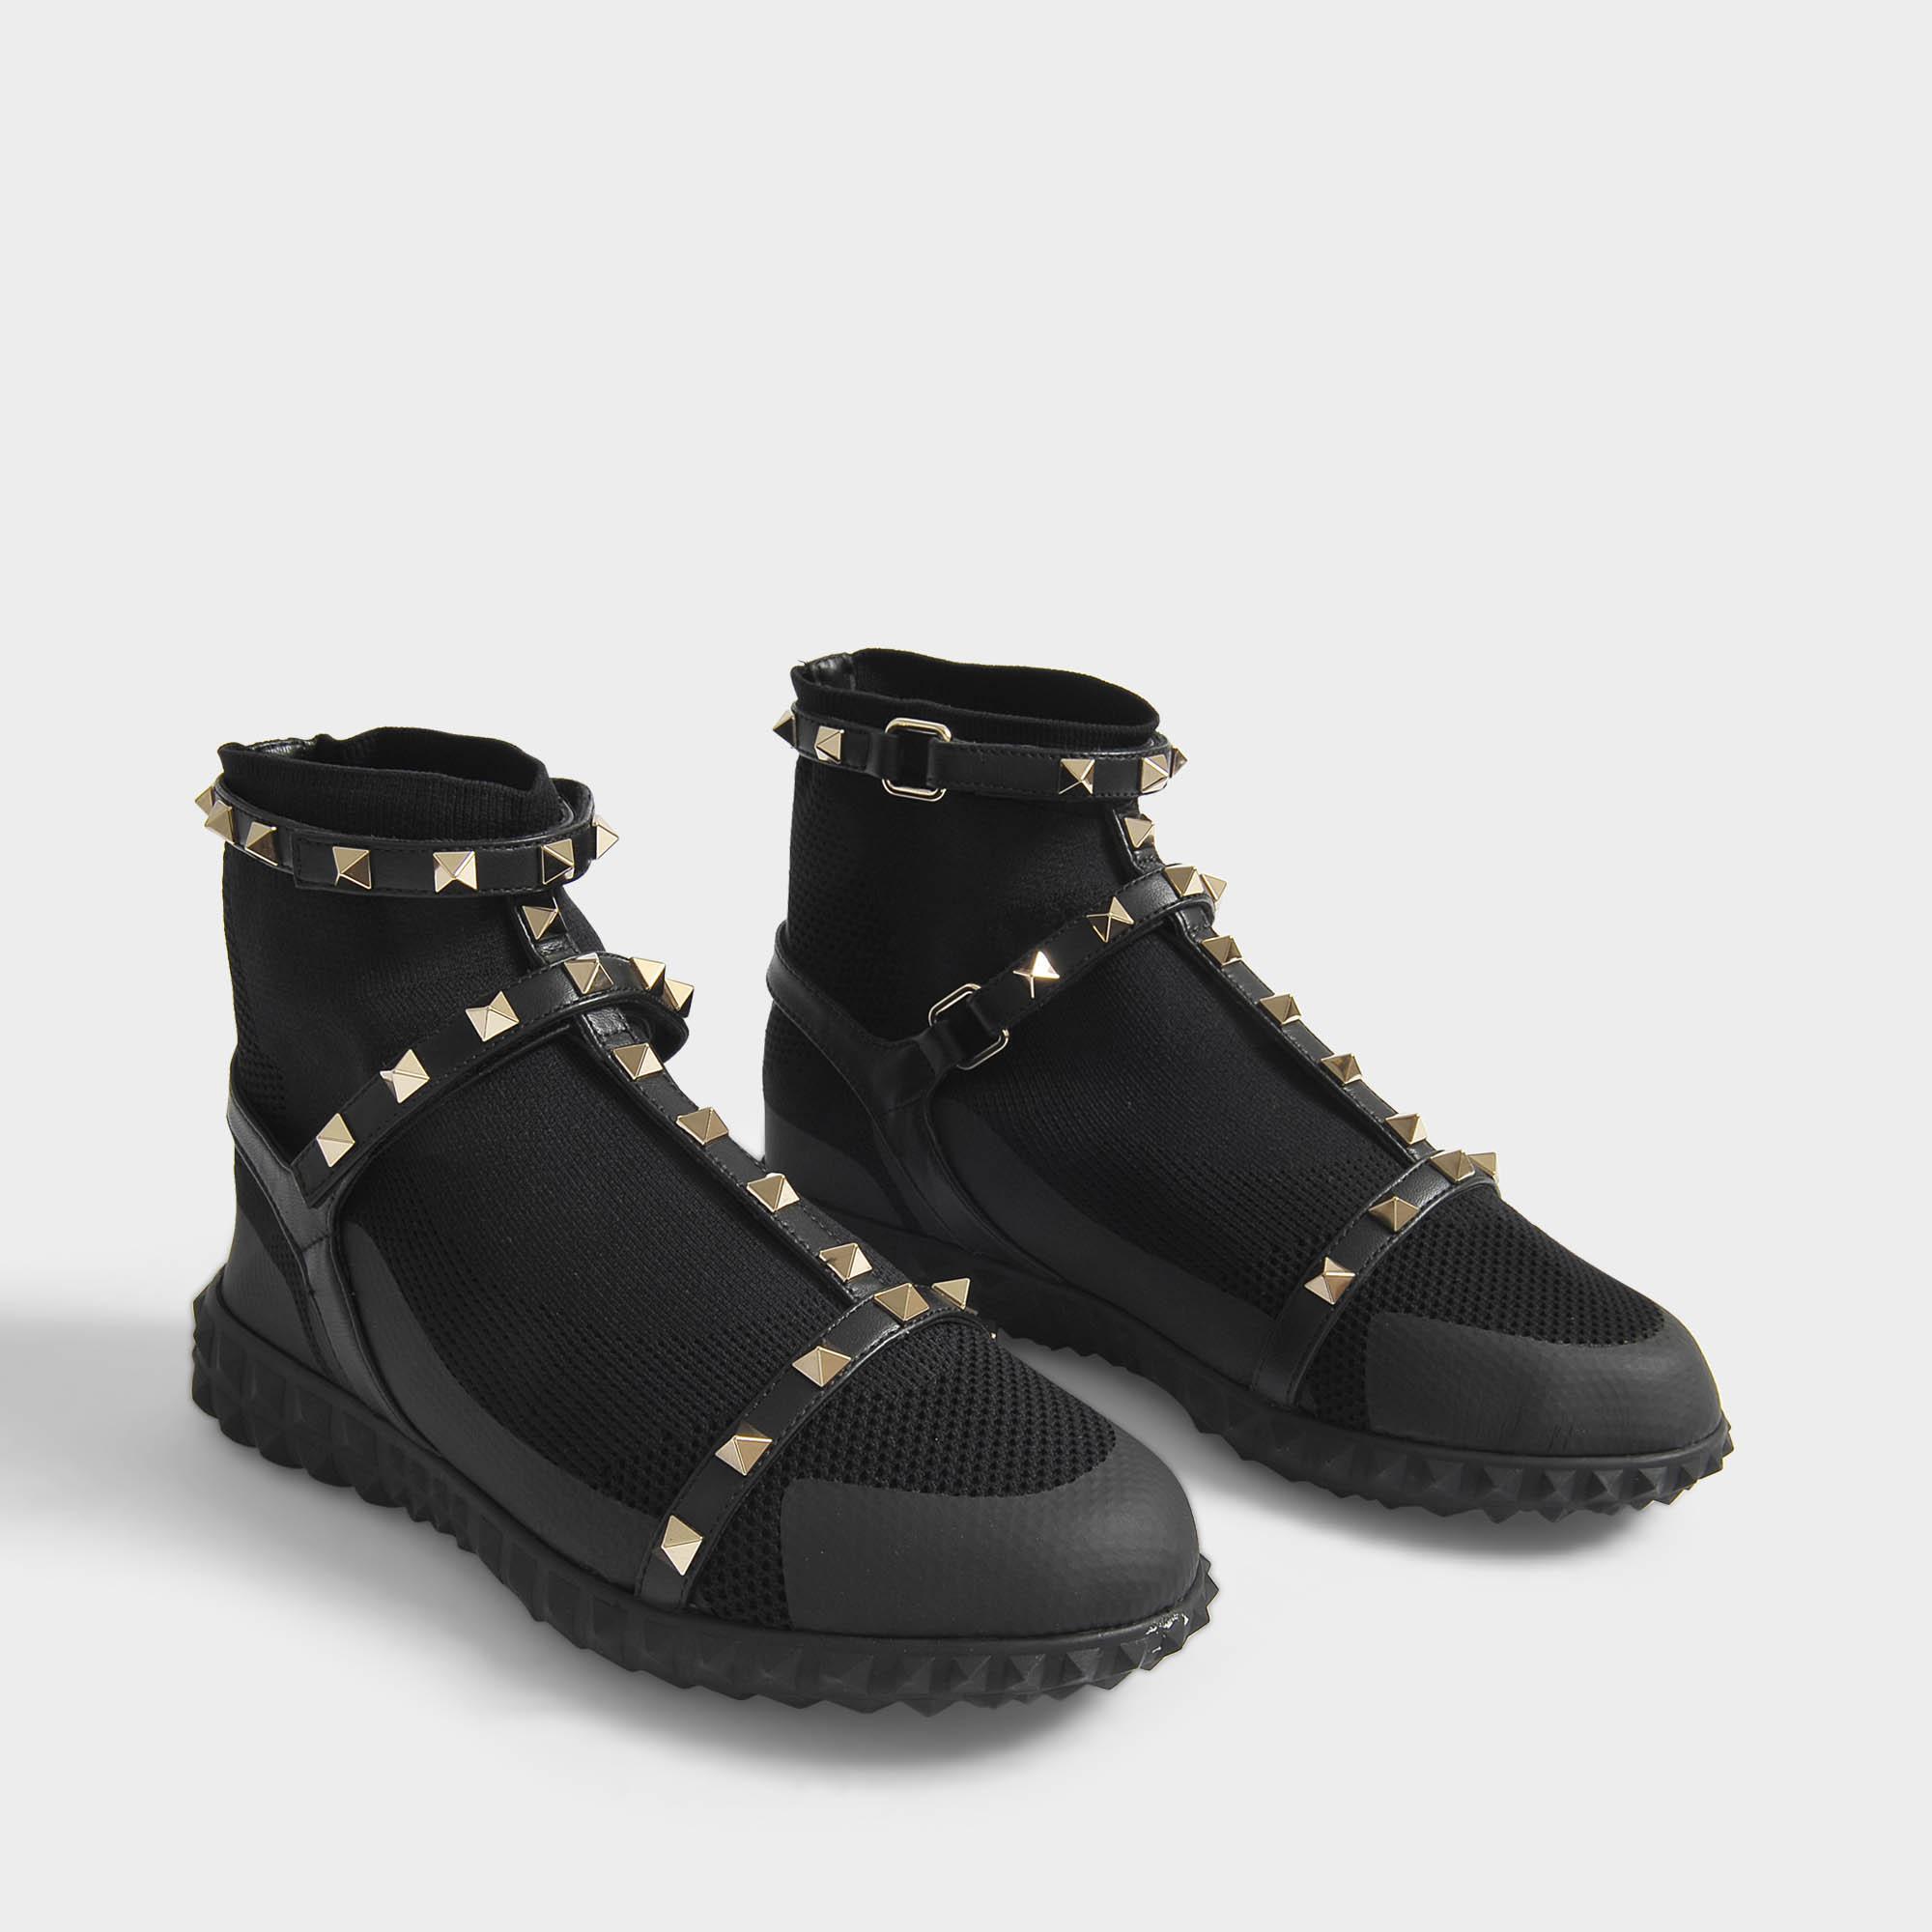 Rockstud Bodytech Hightop Sneakers in Black Nylon Valentino uMF3zED